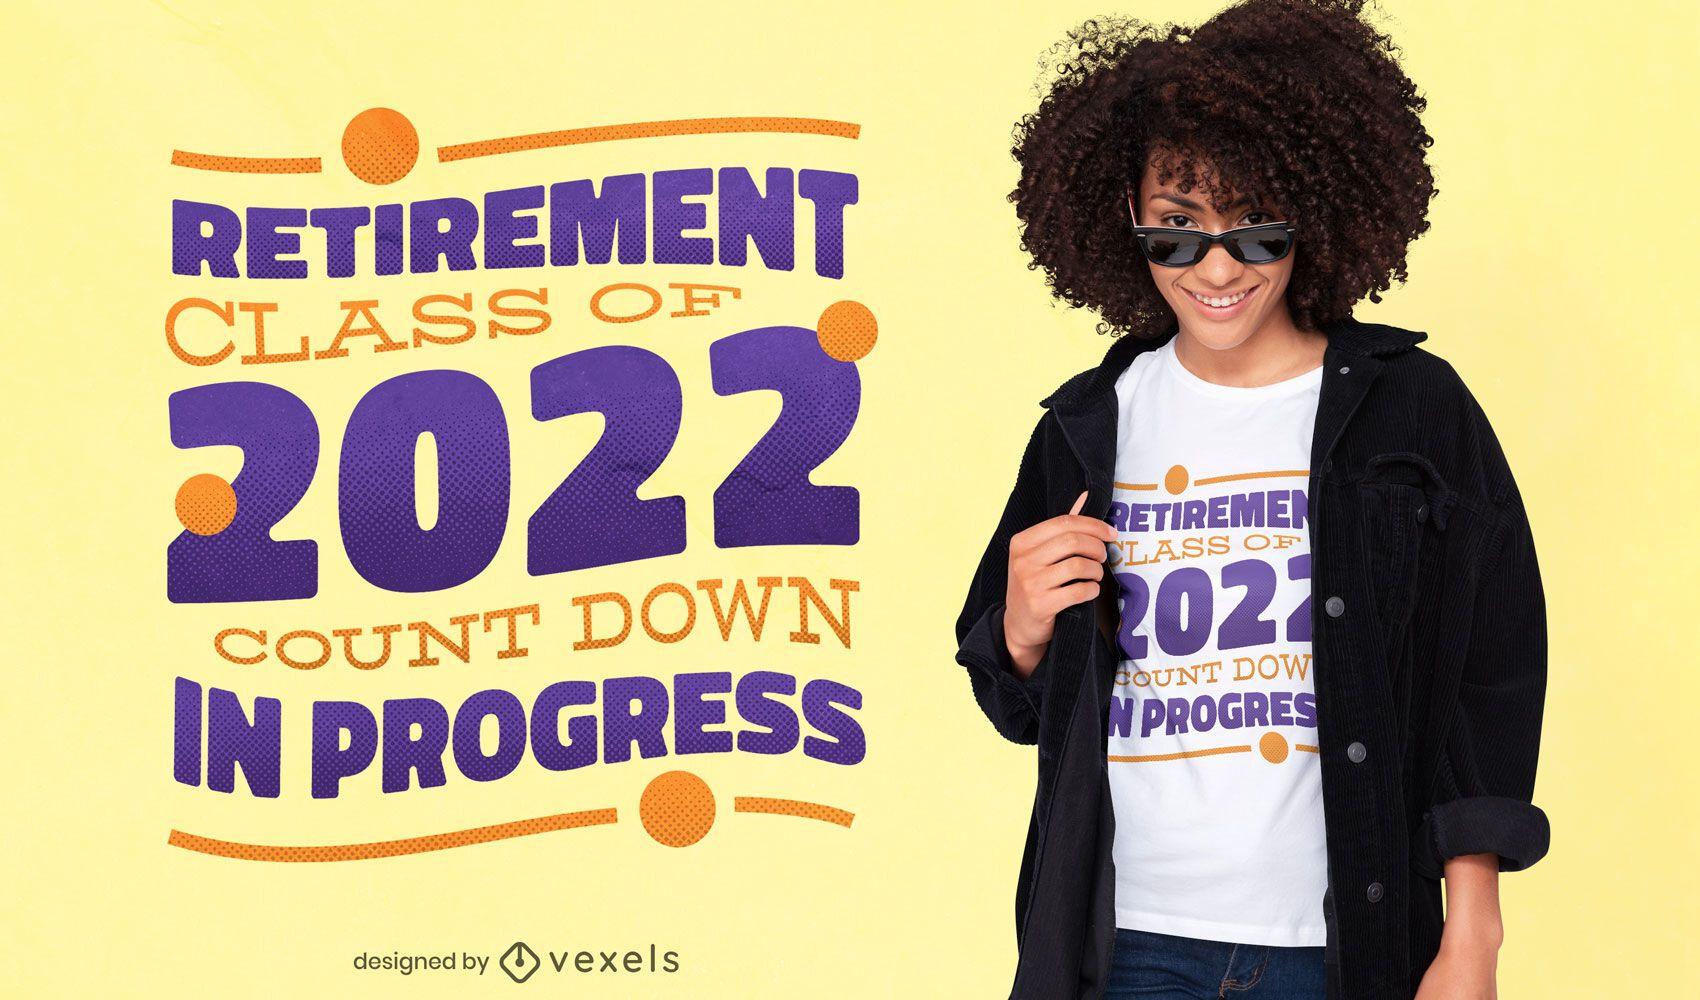 Retirement 2022 funny quote t-shirt design